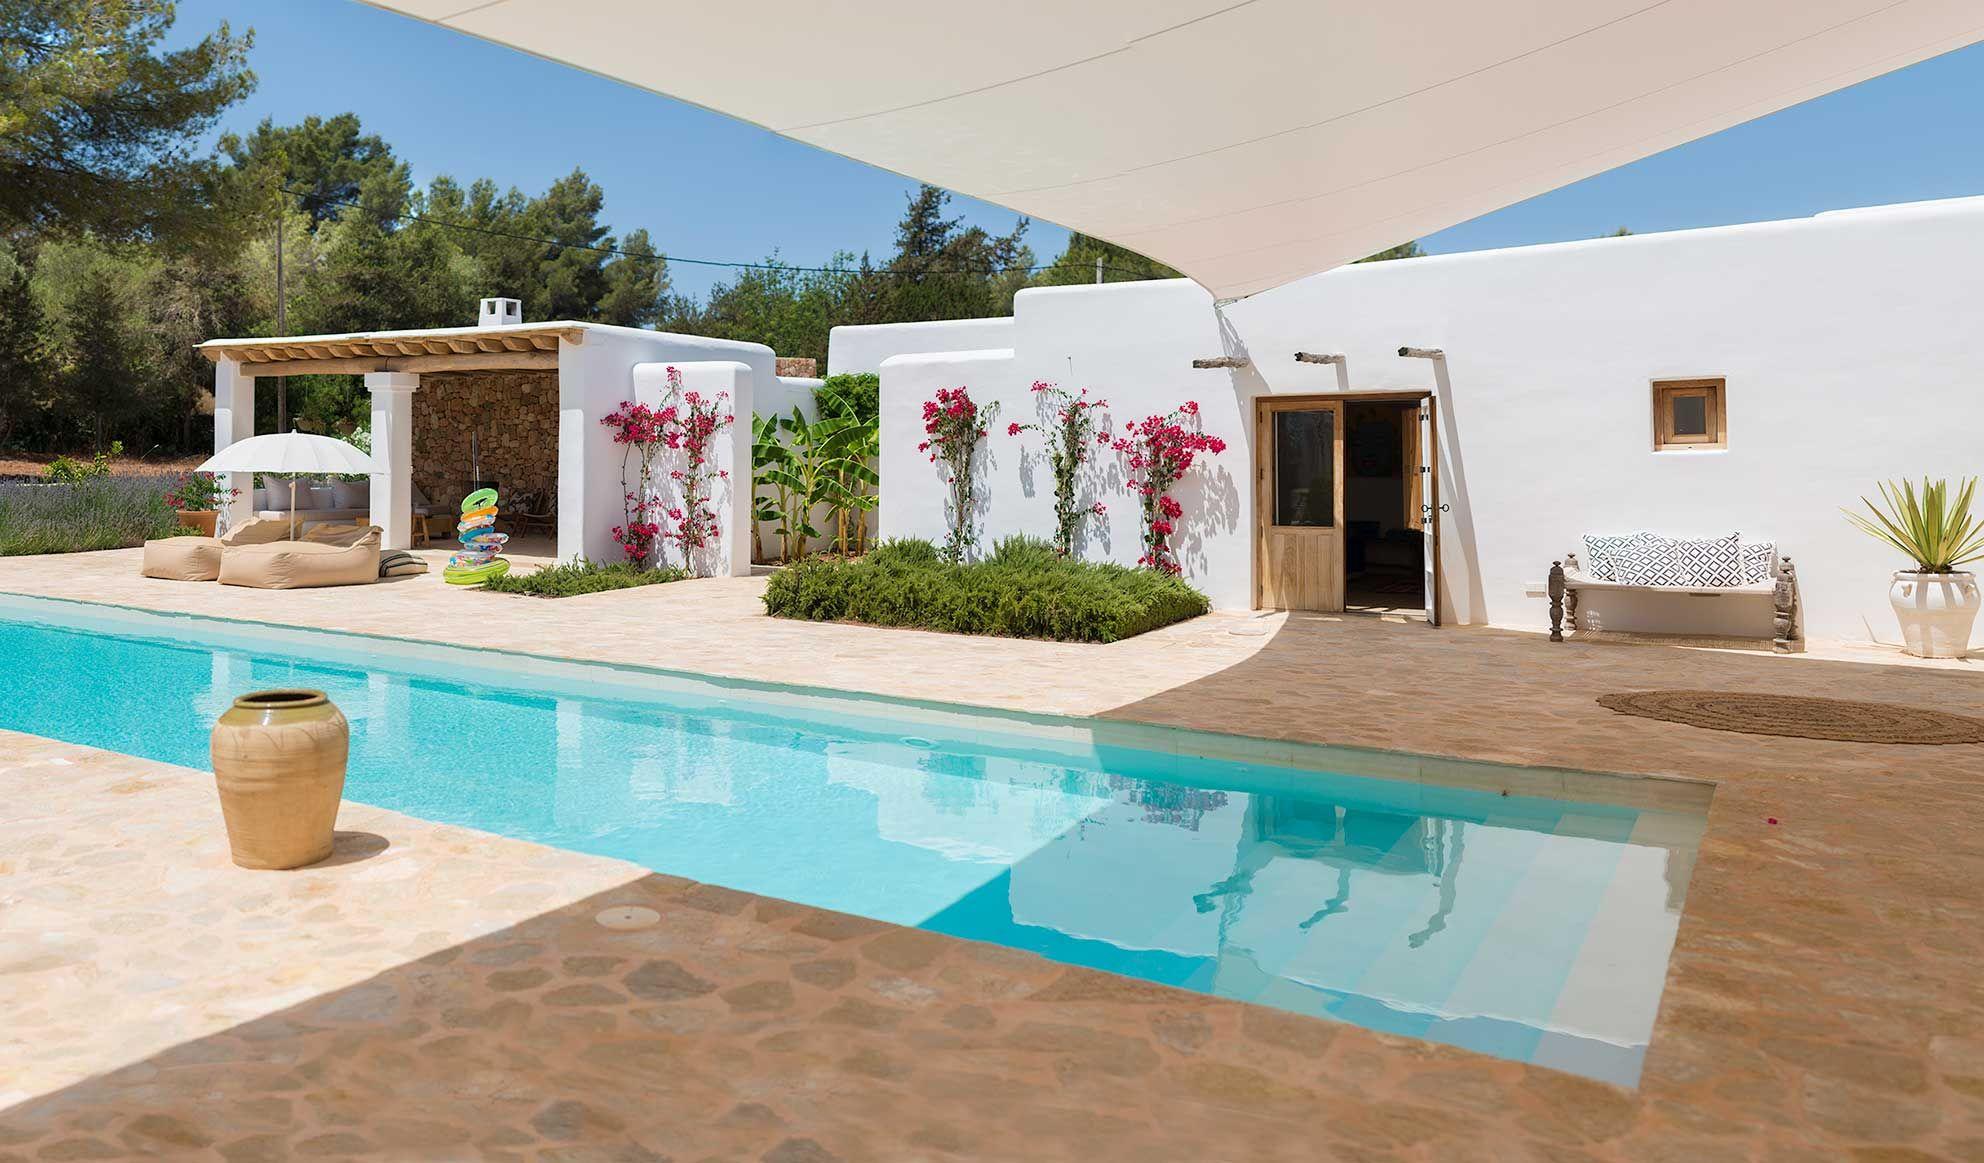 COCOON Ibiza villa design inspiration bycocoon.com | interior ...